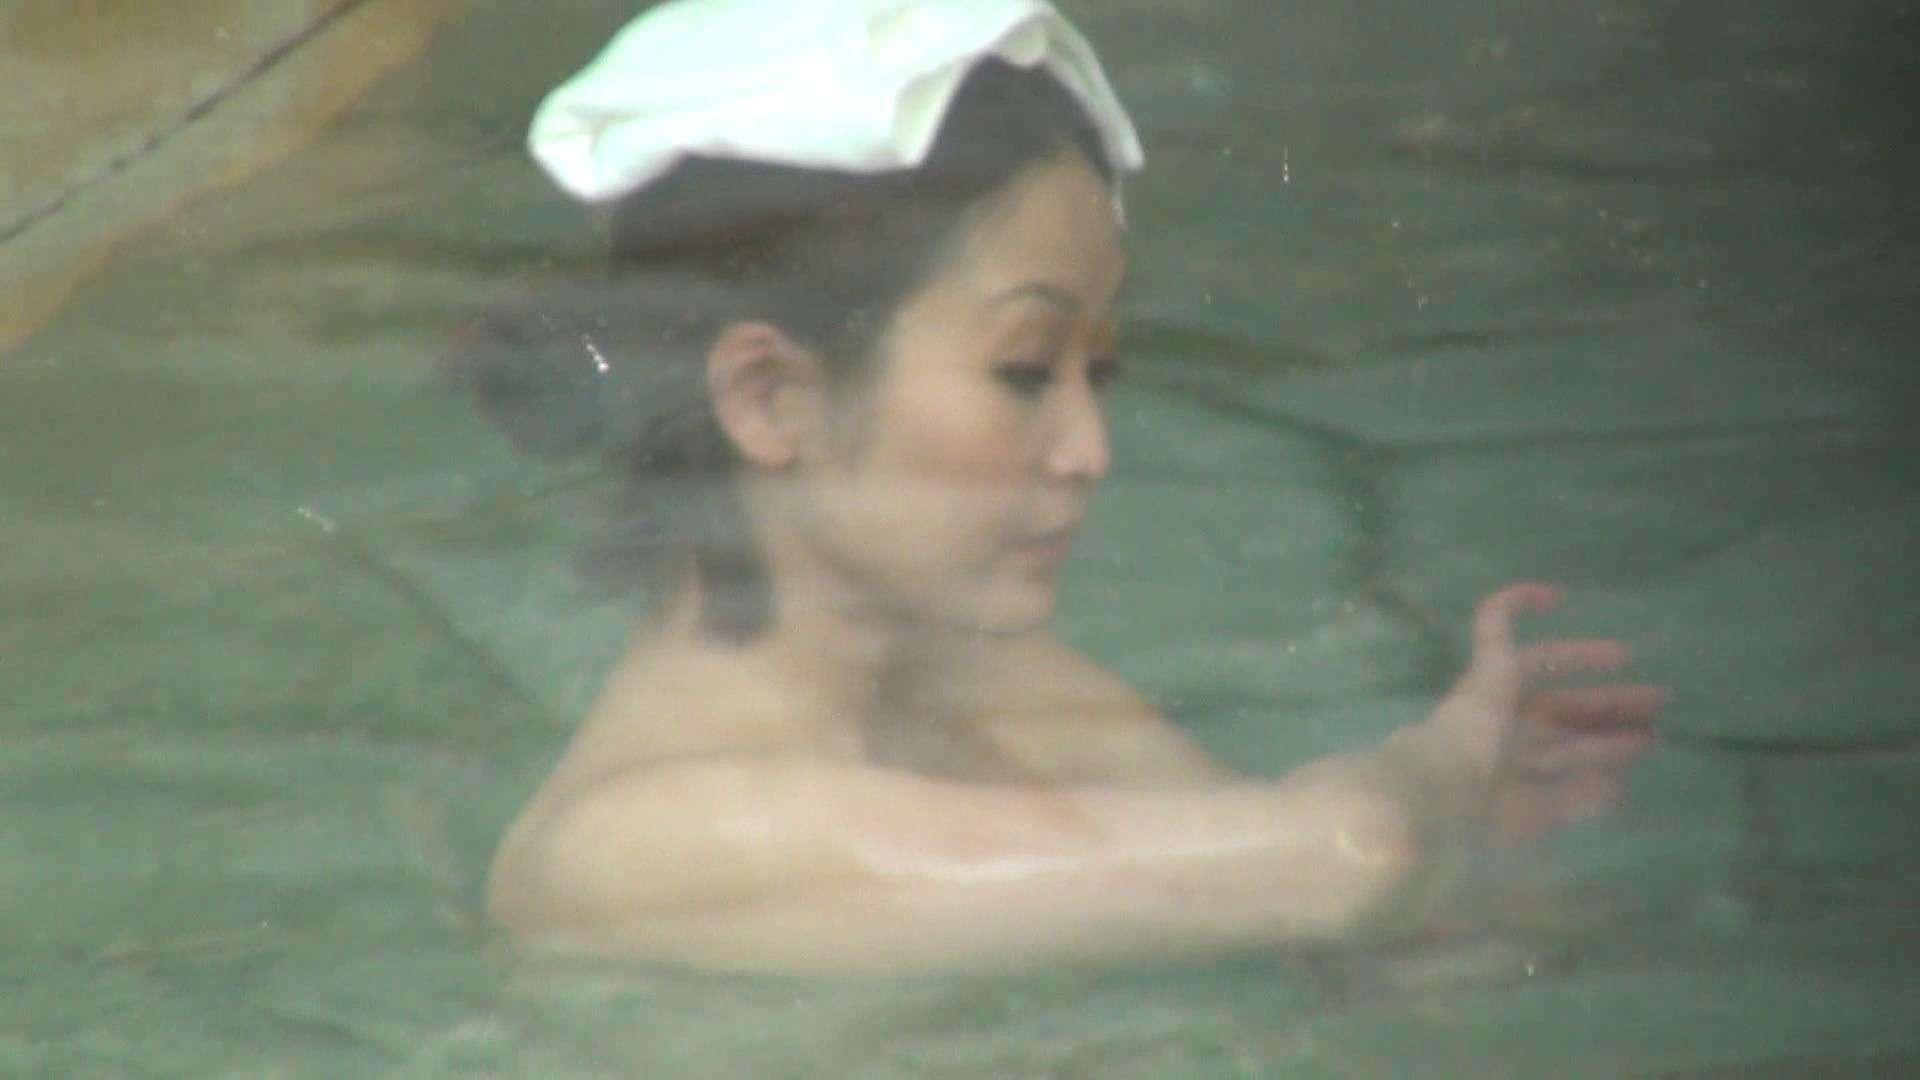 Aquaな露天風呂Vol.284 OLのエロ生活 おまんこ動画流出 35連発 2